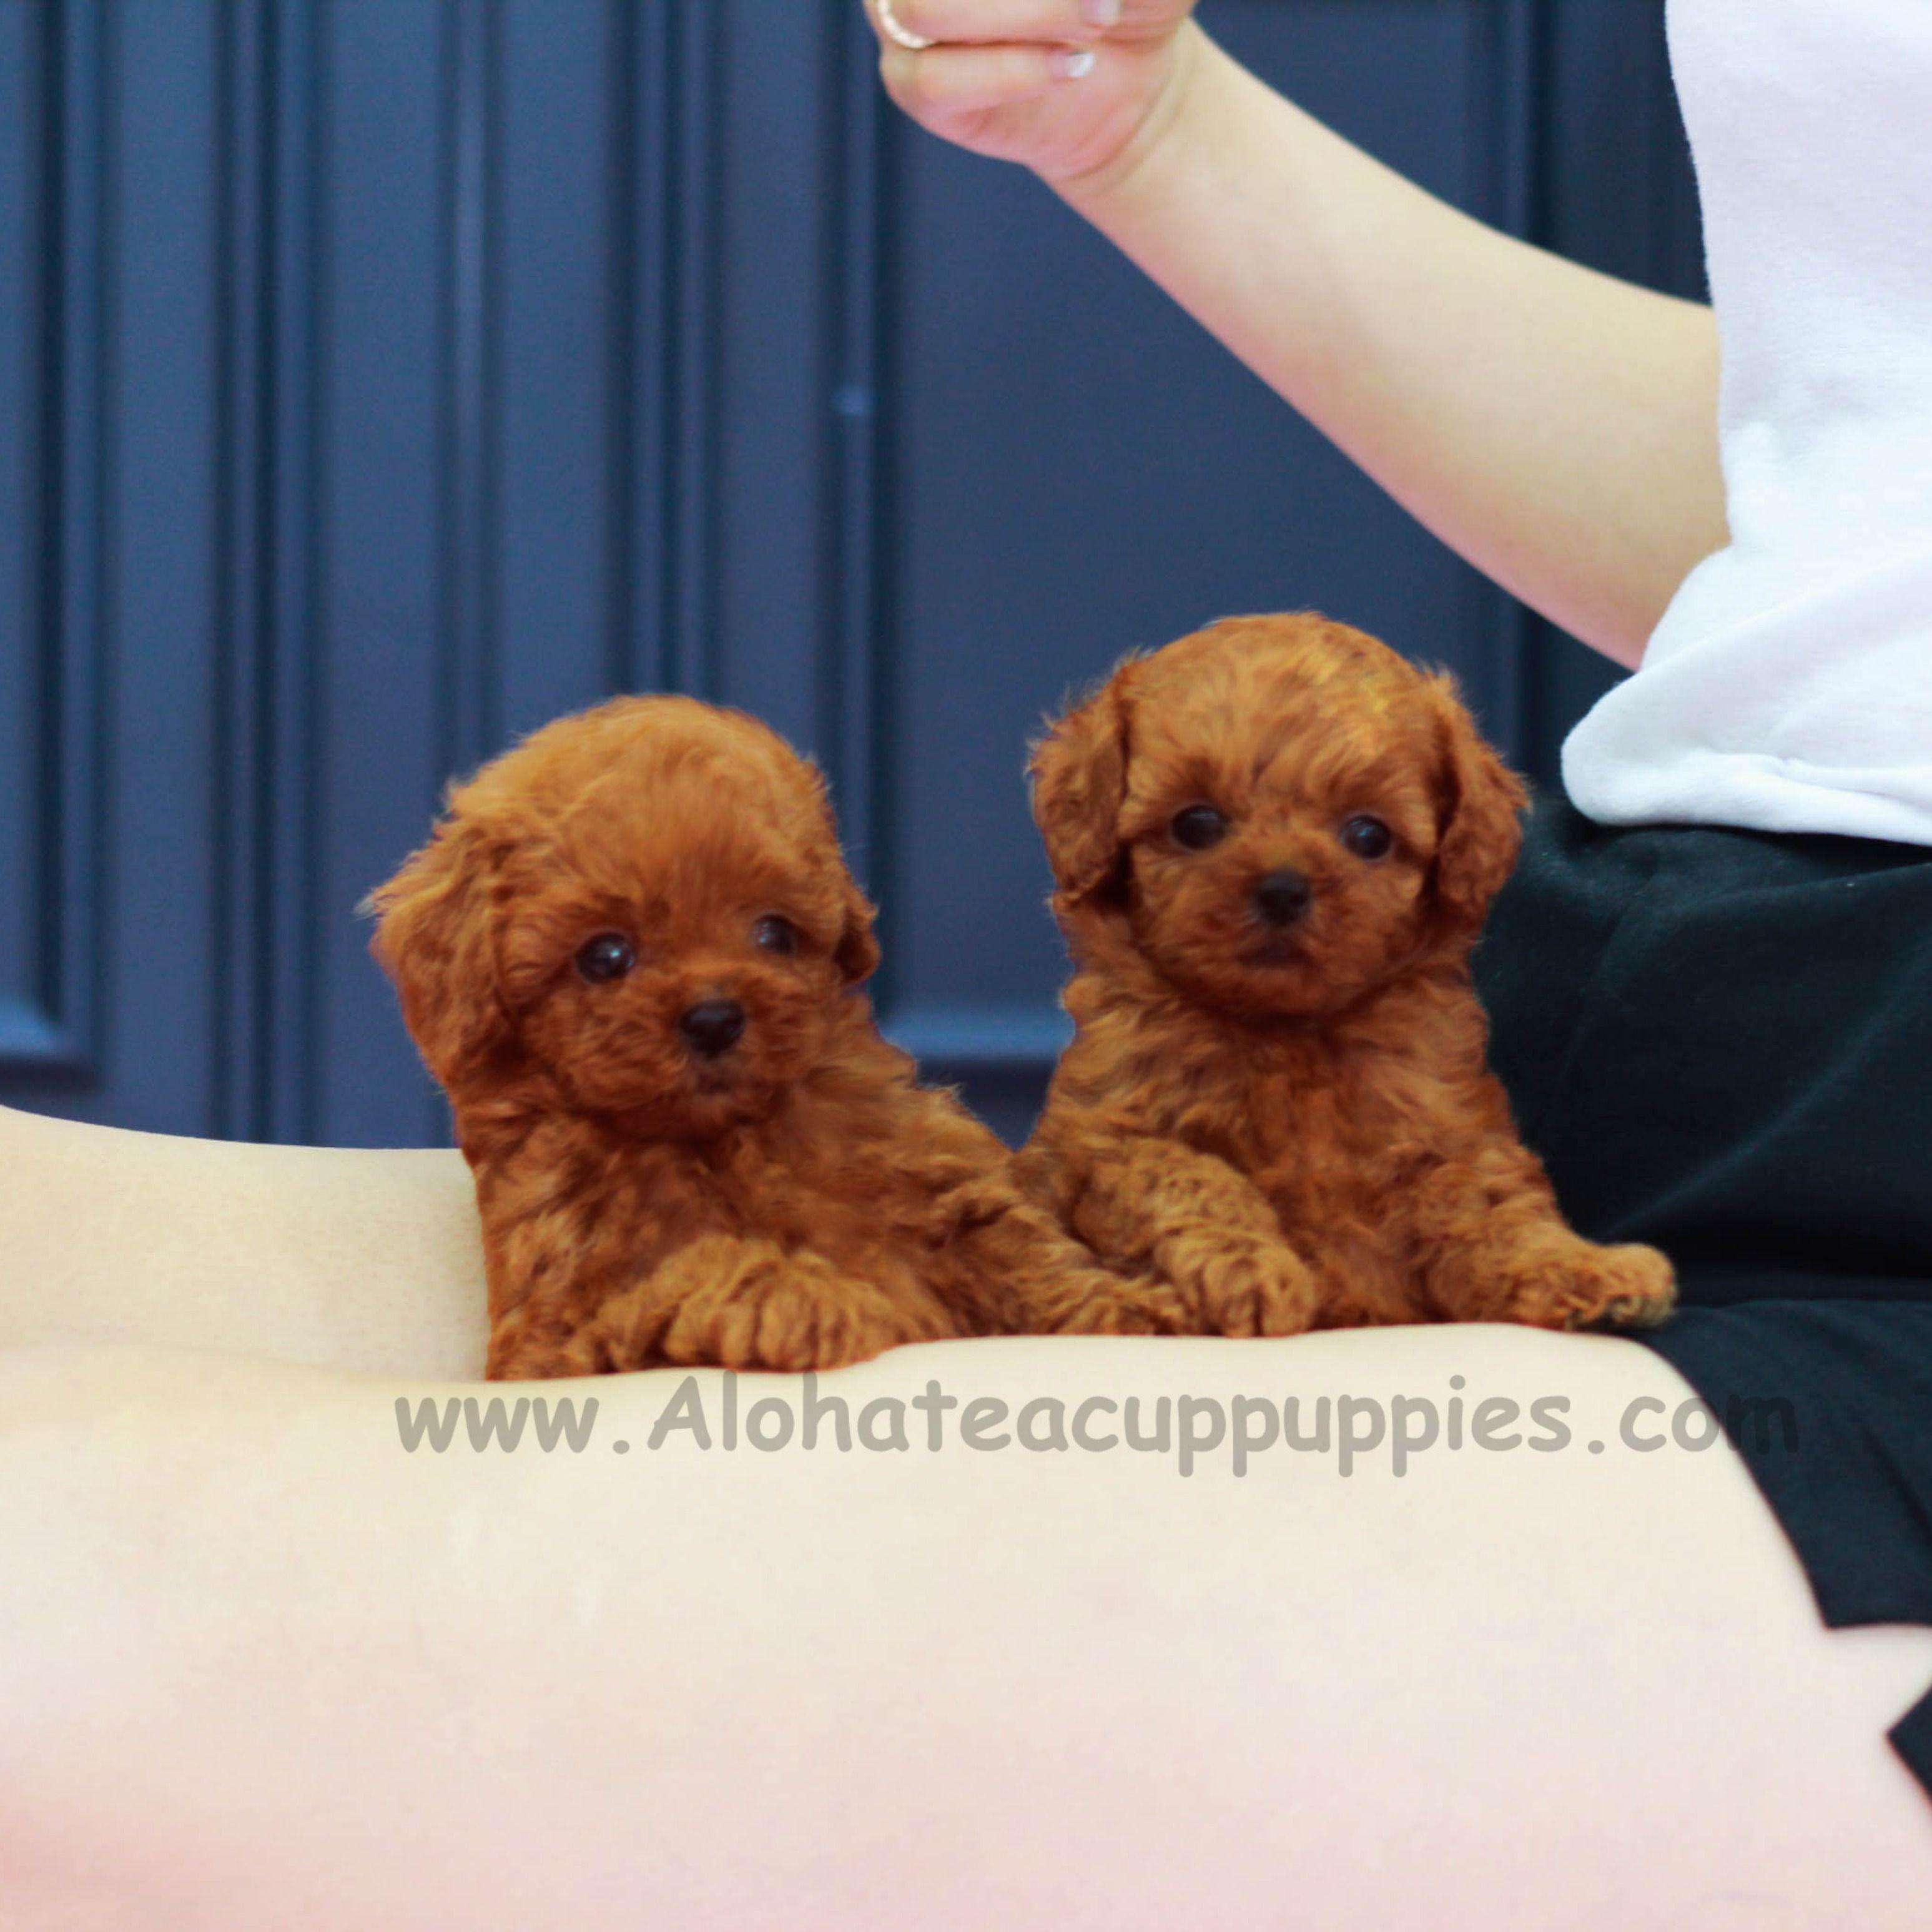 Sooo Cutie Twins Https Www Alohateacuppuppies Com